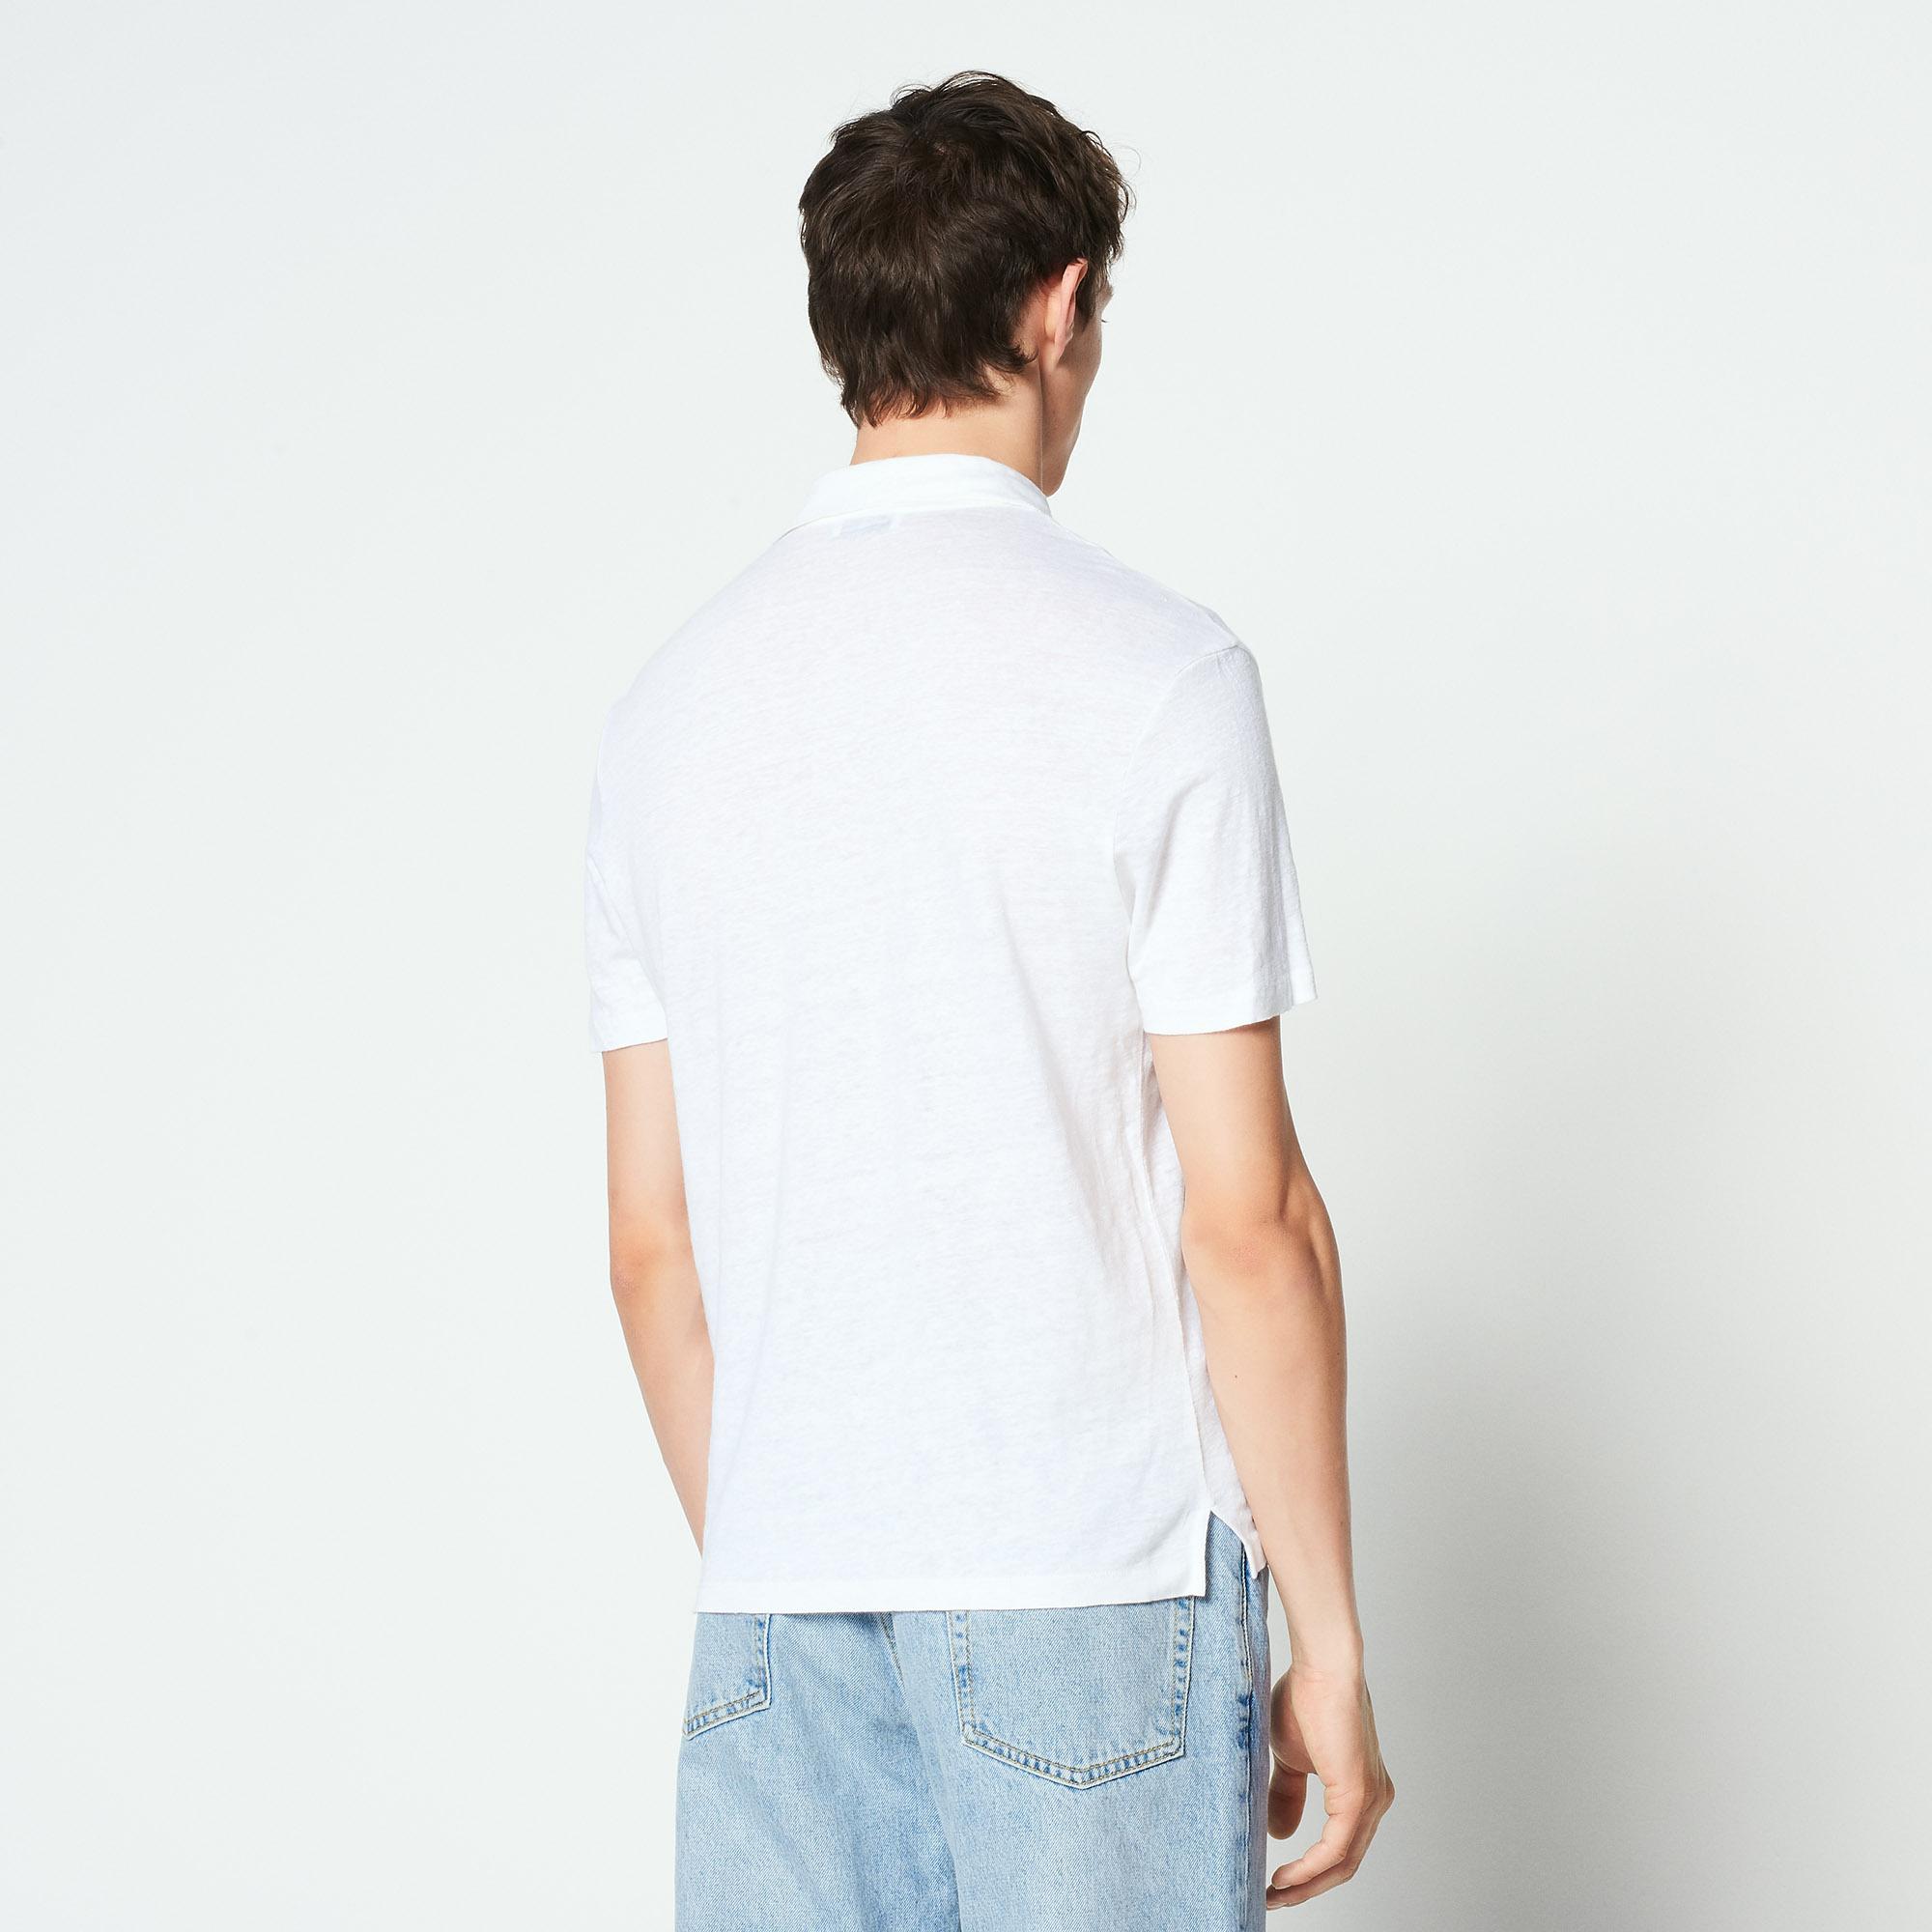 Beach T Shirts Polos Sandro Paris